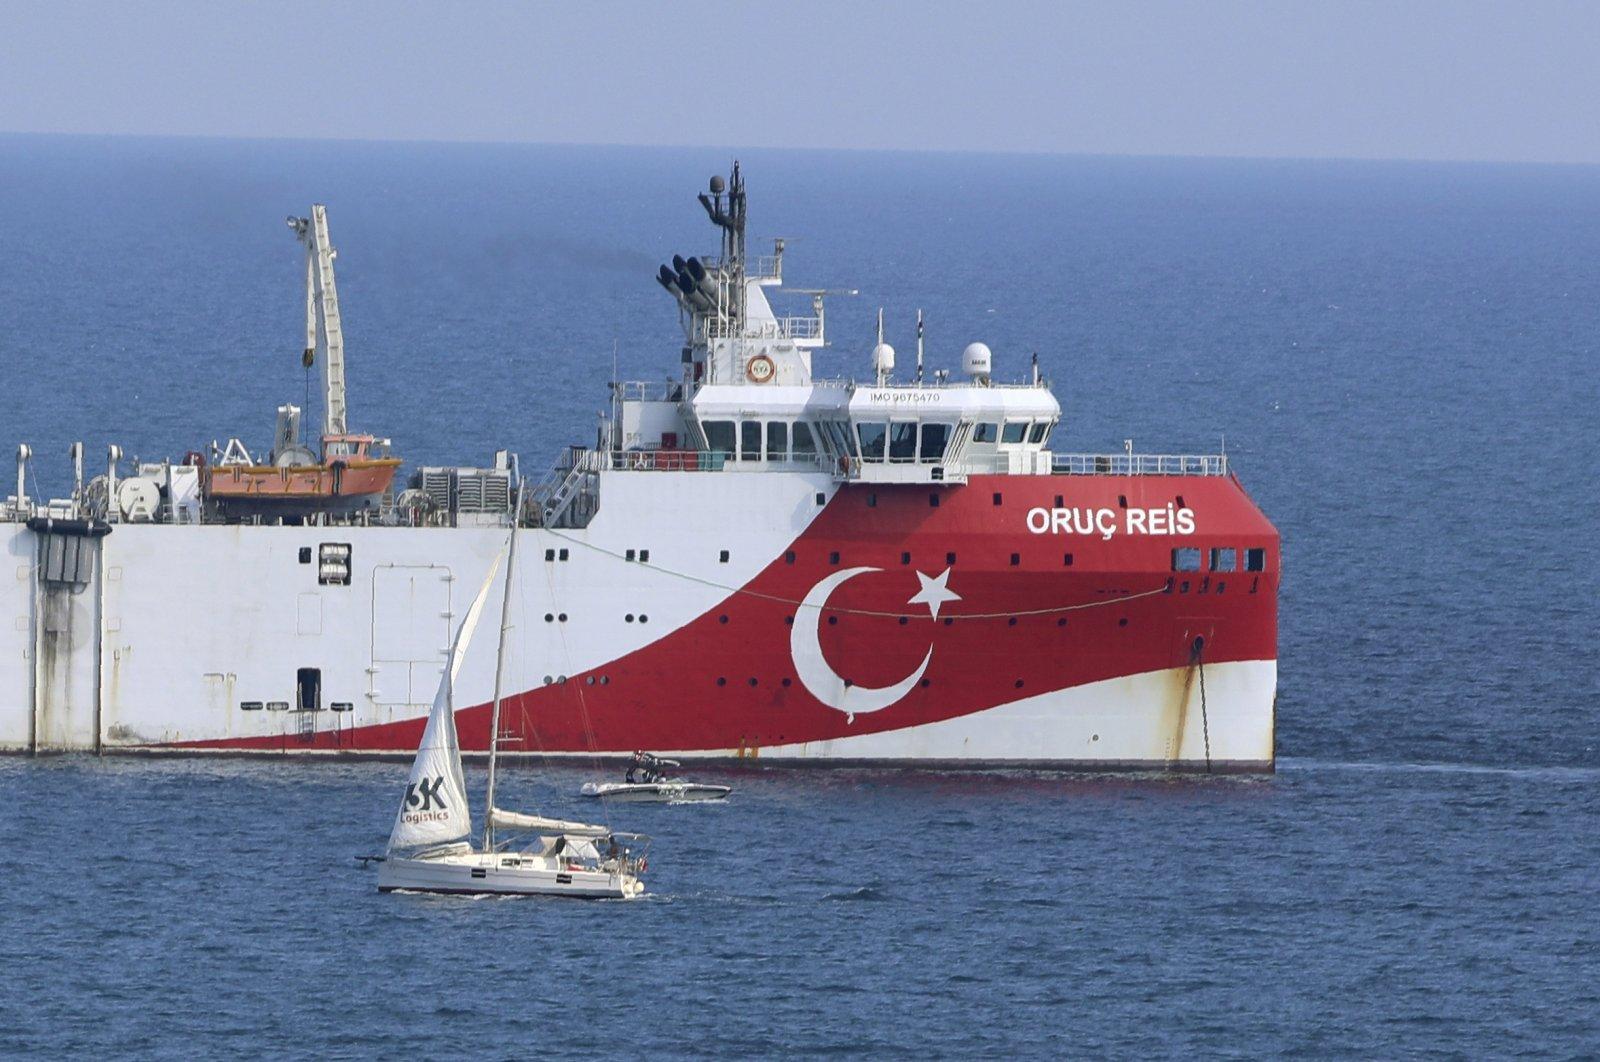 Turkey's research vessel Oruc Reis anchors off the coast of Antalya in the Mediterranean Sea, Turkey. Sept. 13, 2020. (AP Photo)